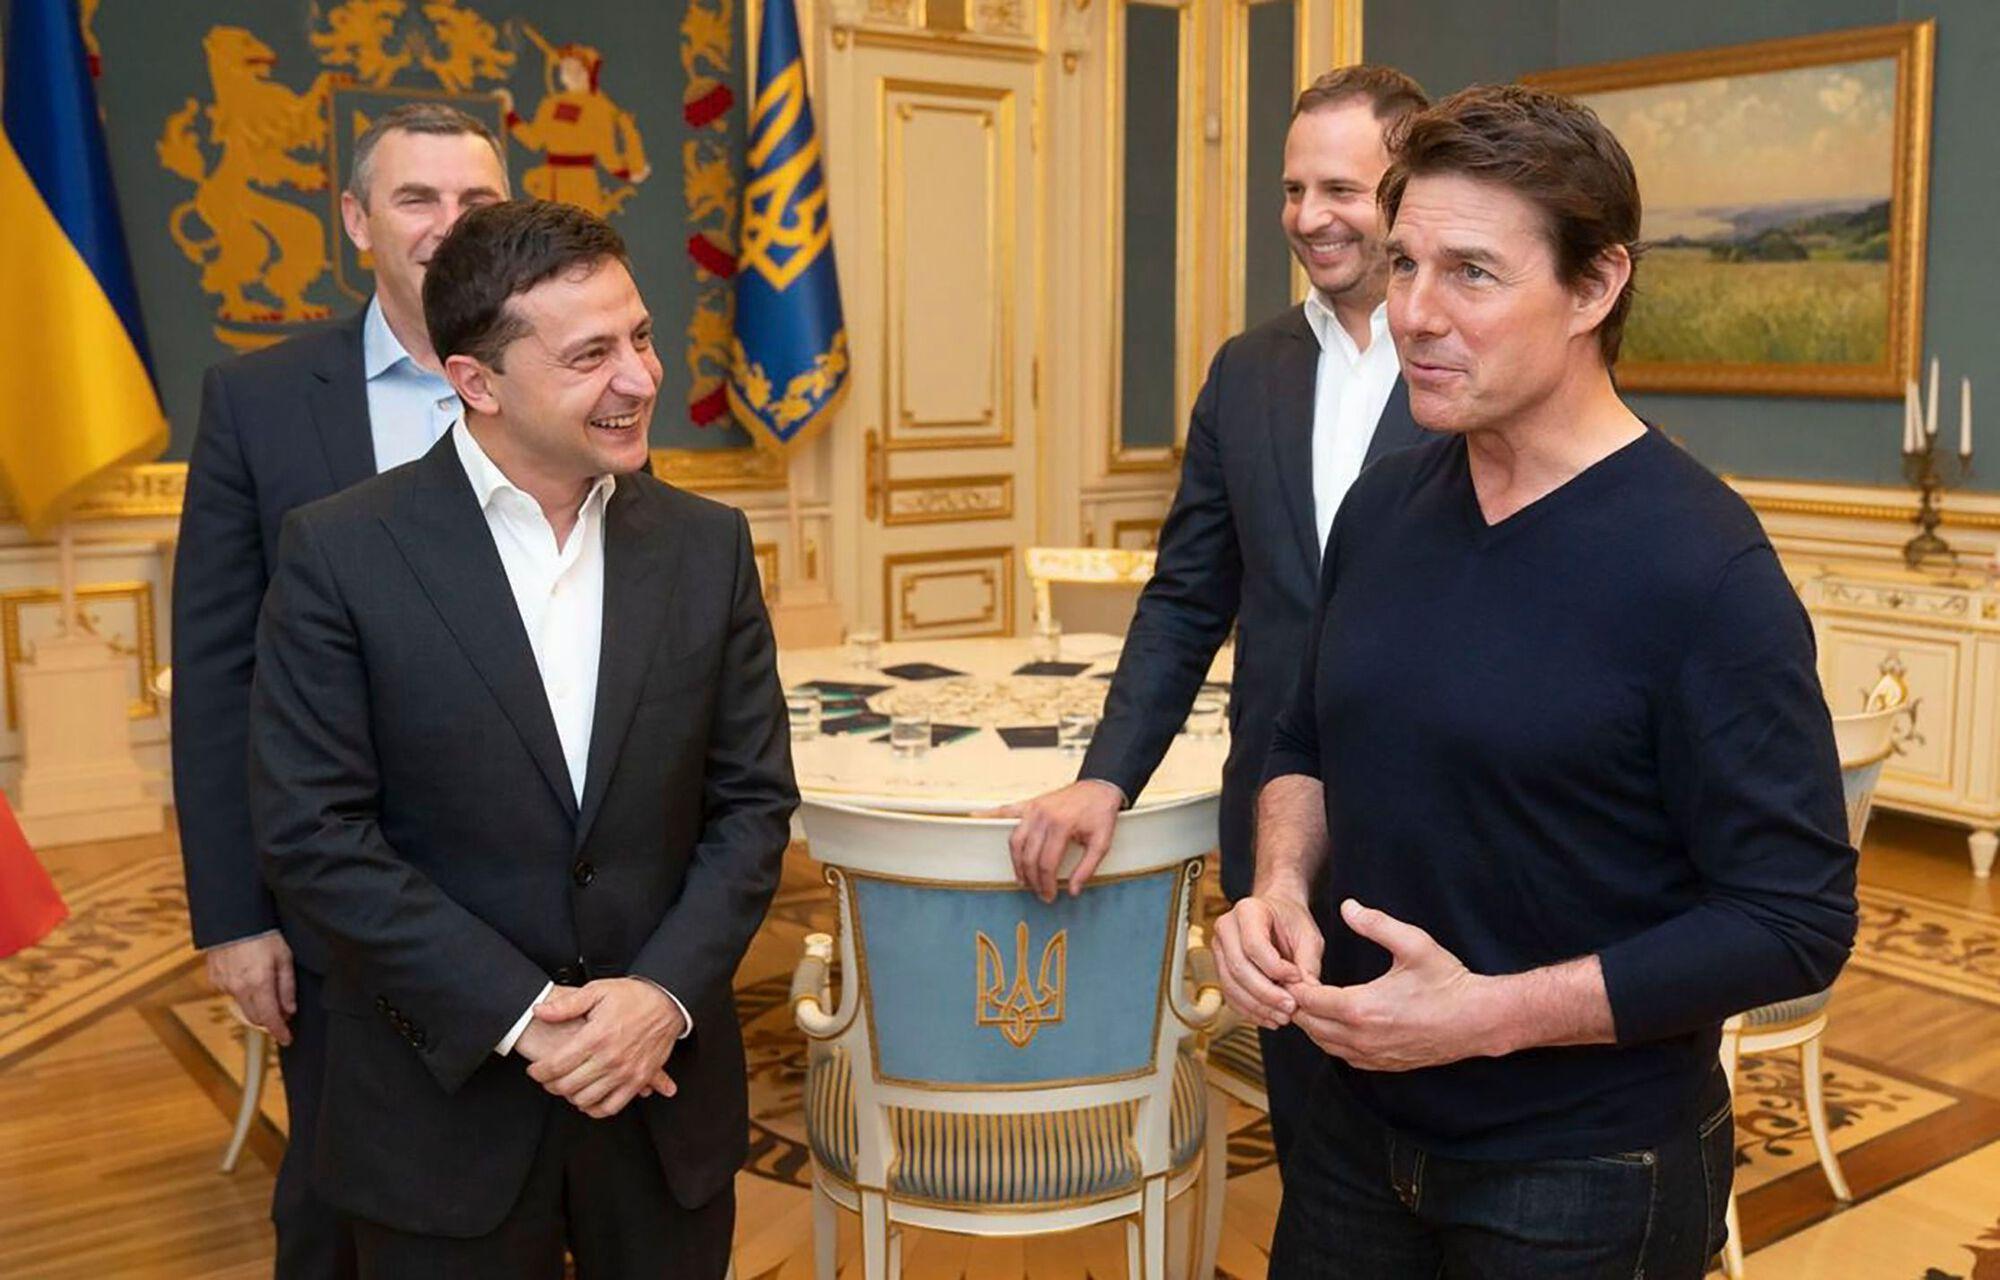 tom cruise ukrán elnök tom cruise a nép szolgája